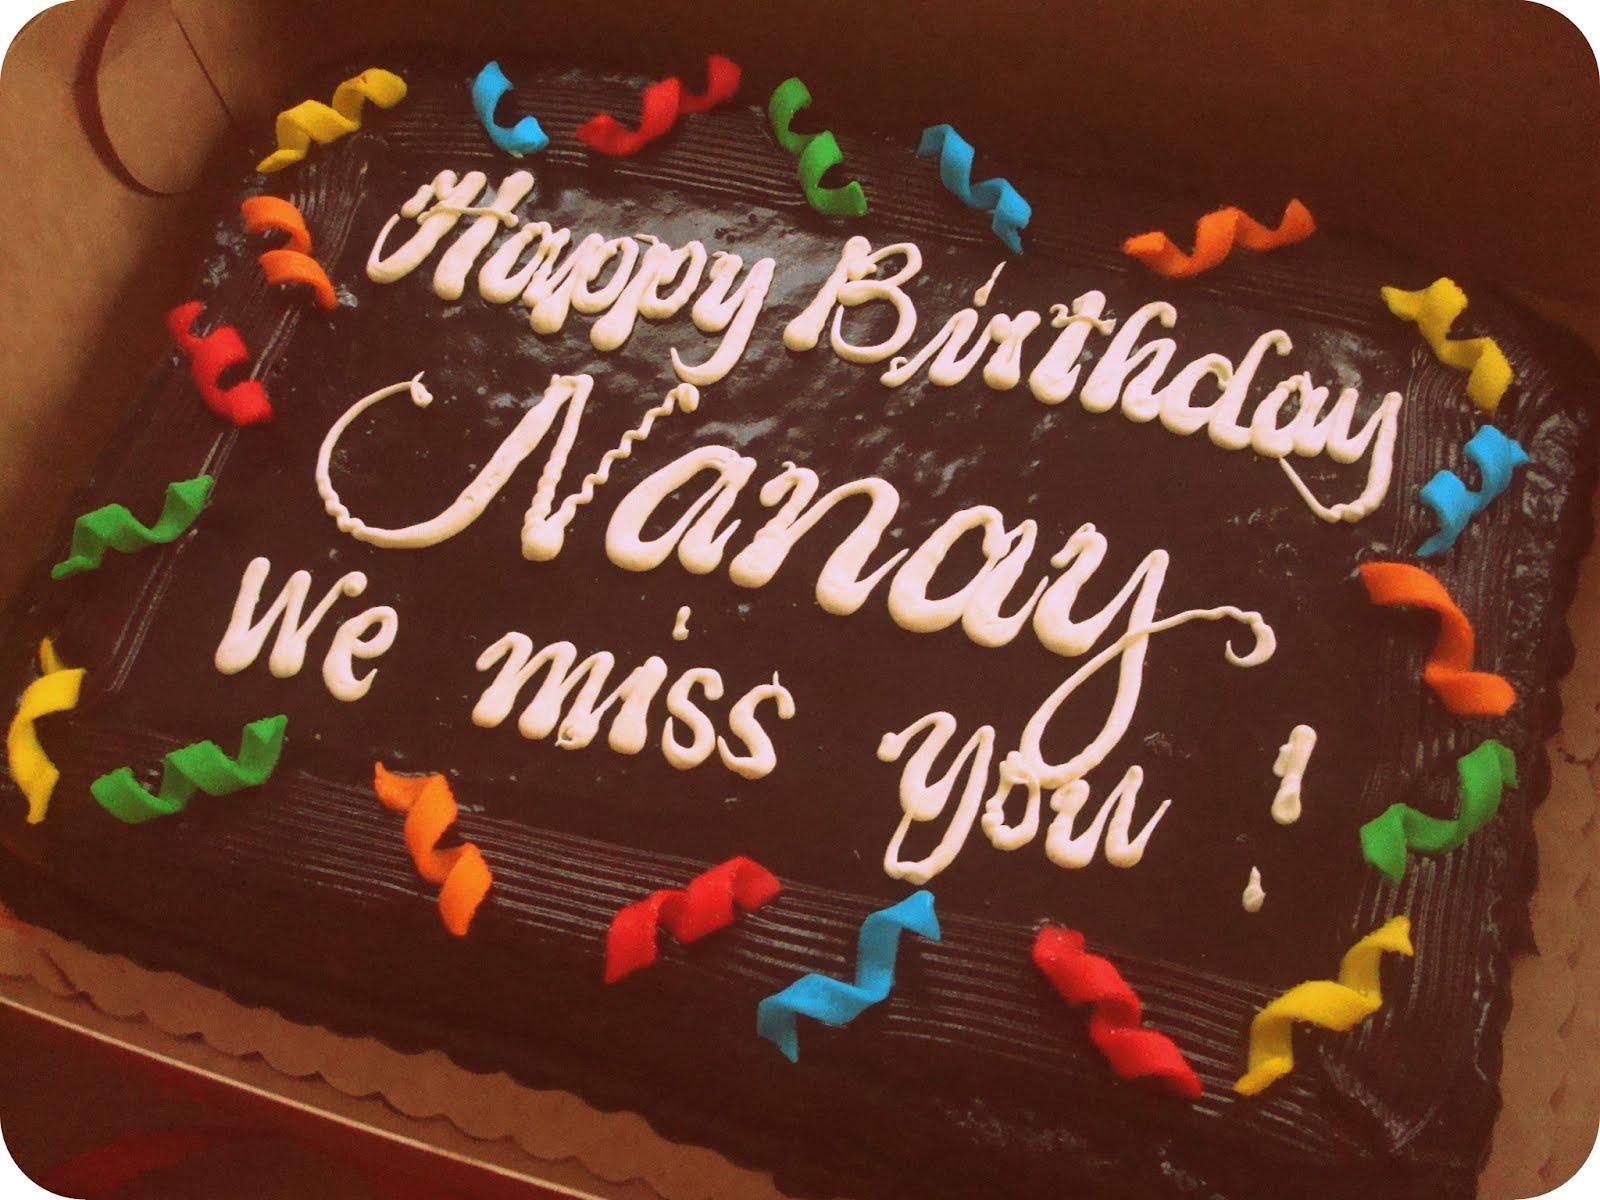 Happy Birthday Nanay We Miss You Marksablan Com